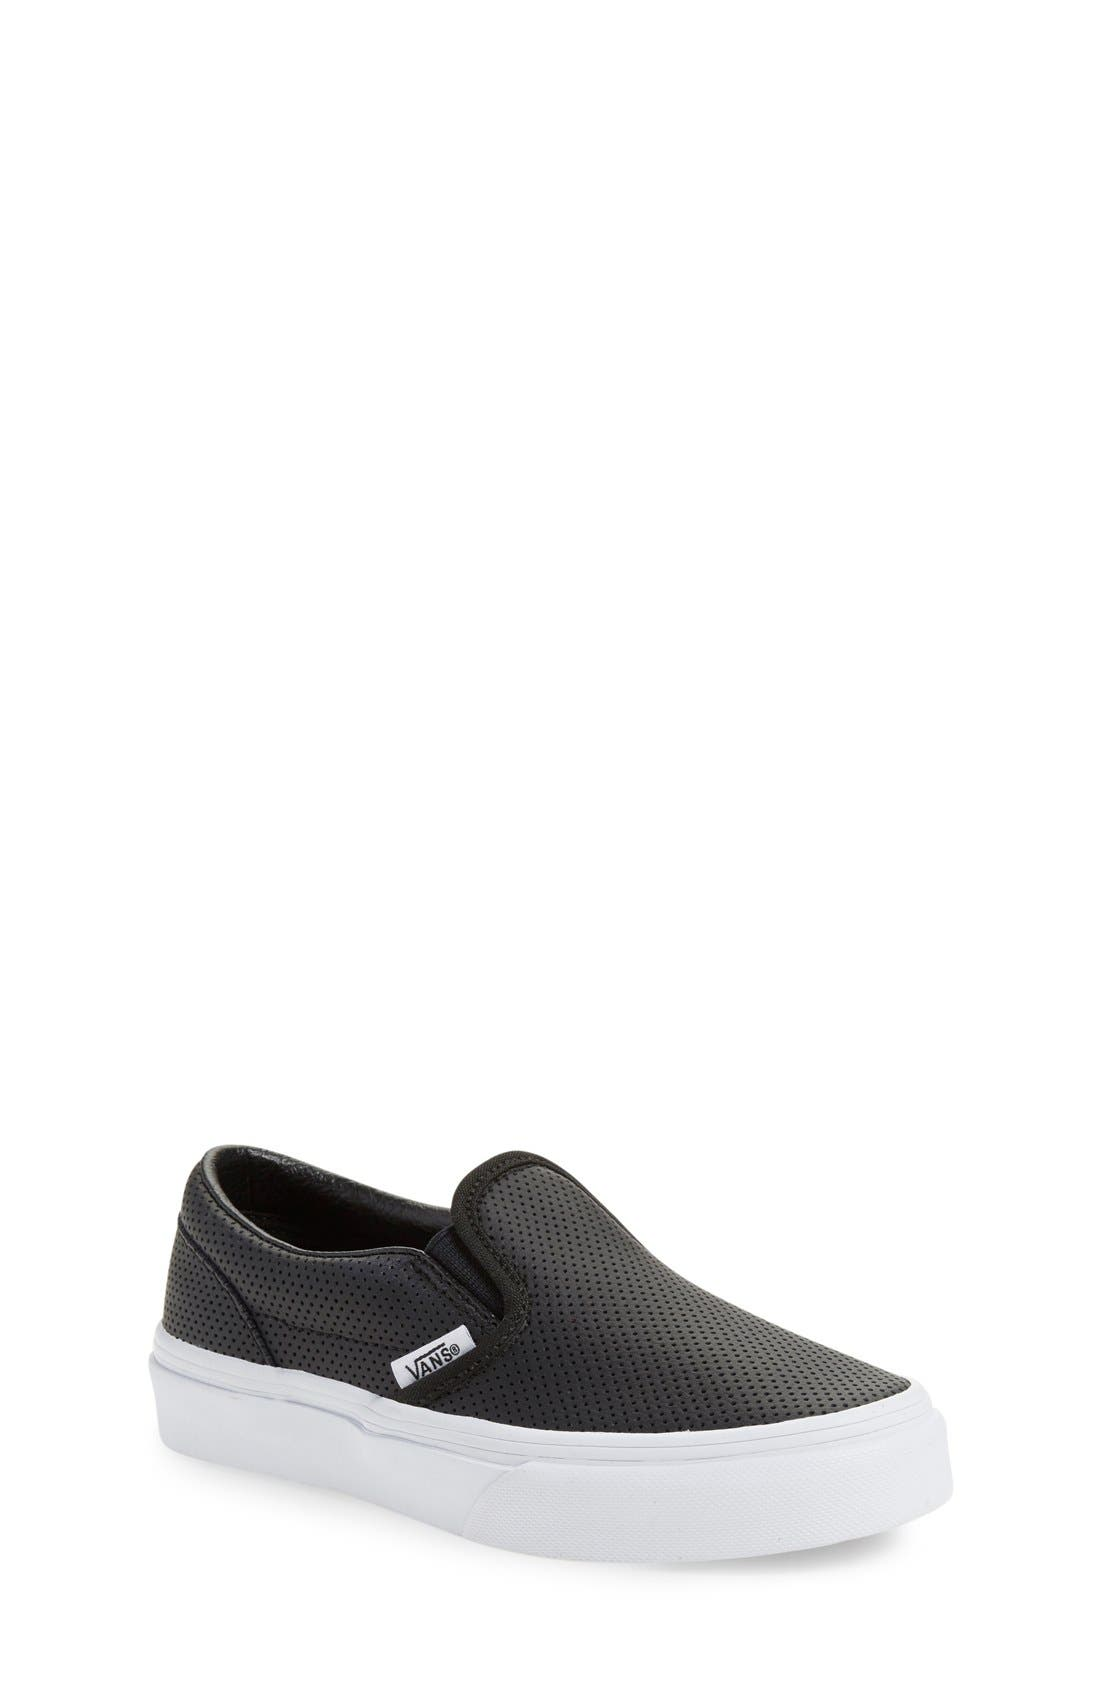 a94302f3015230 Vans  Classic  Slip-On Sneaker